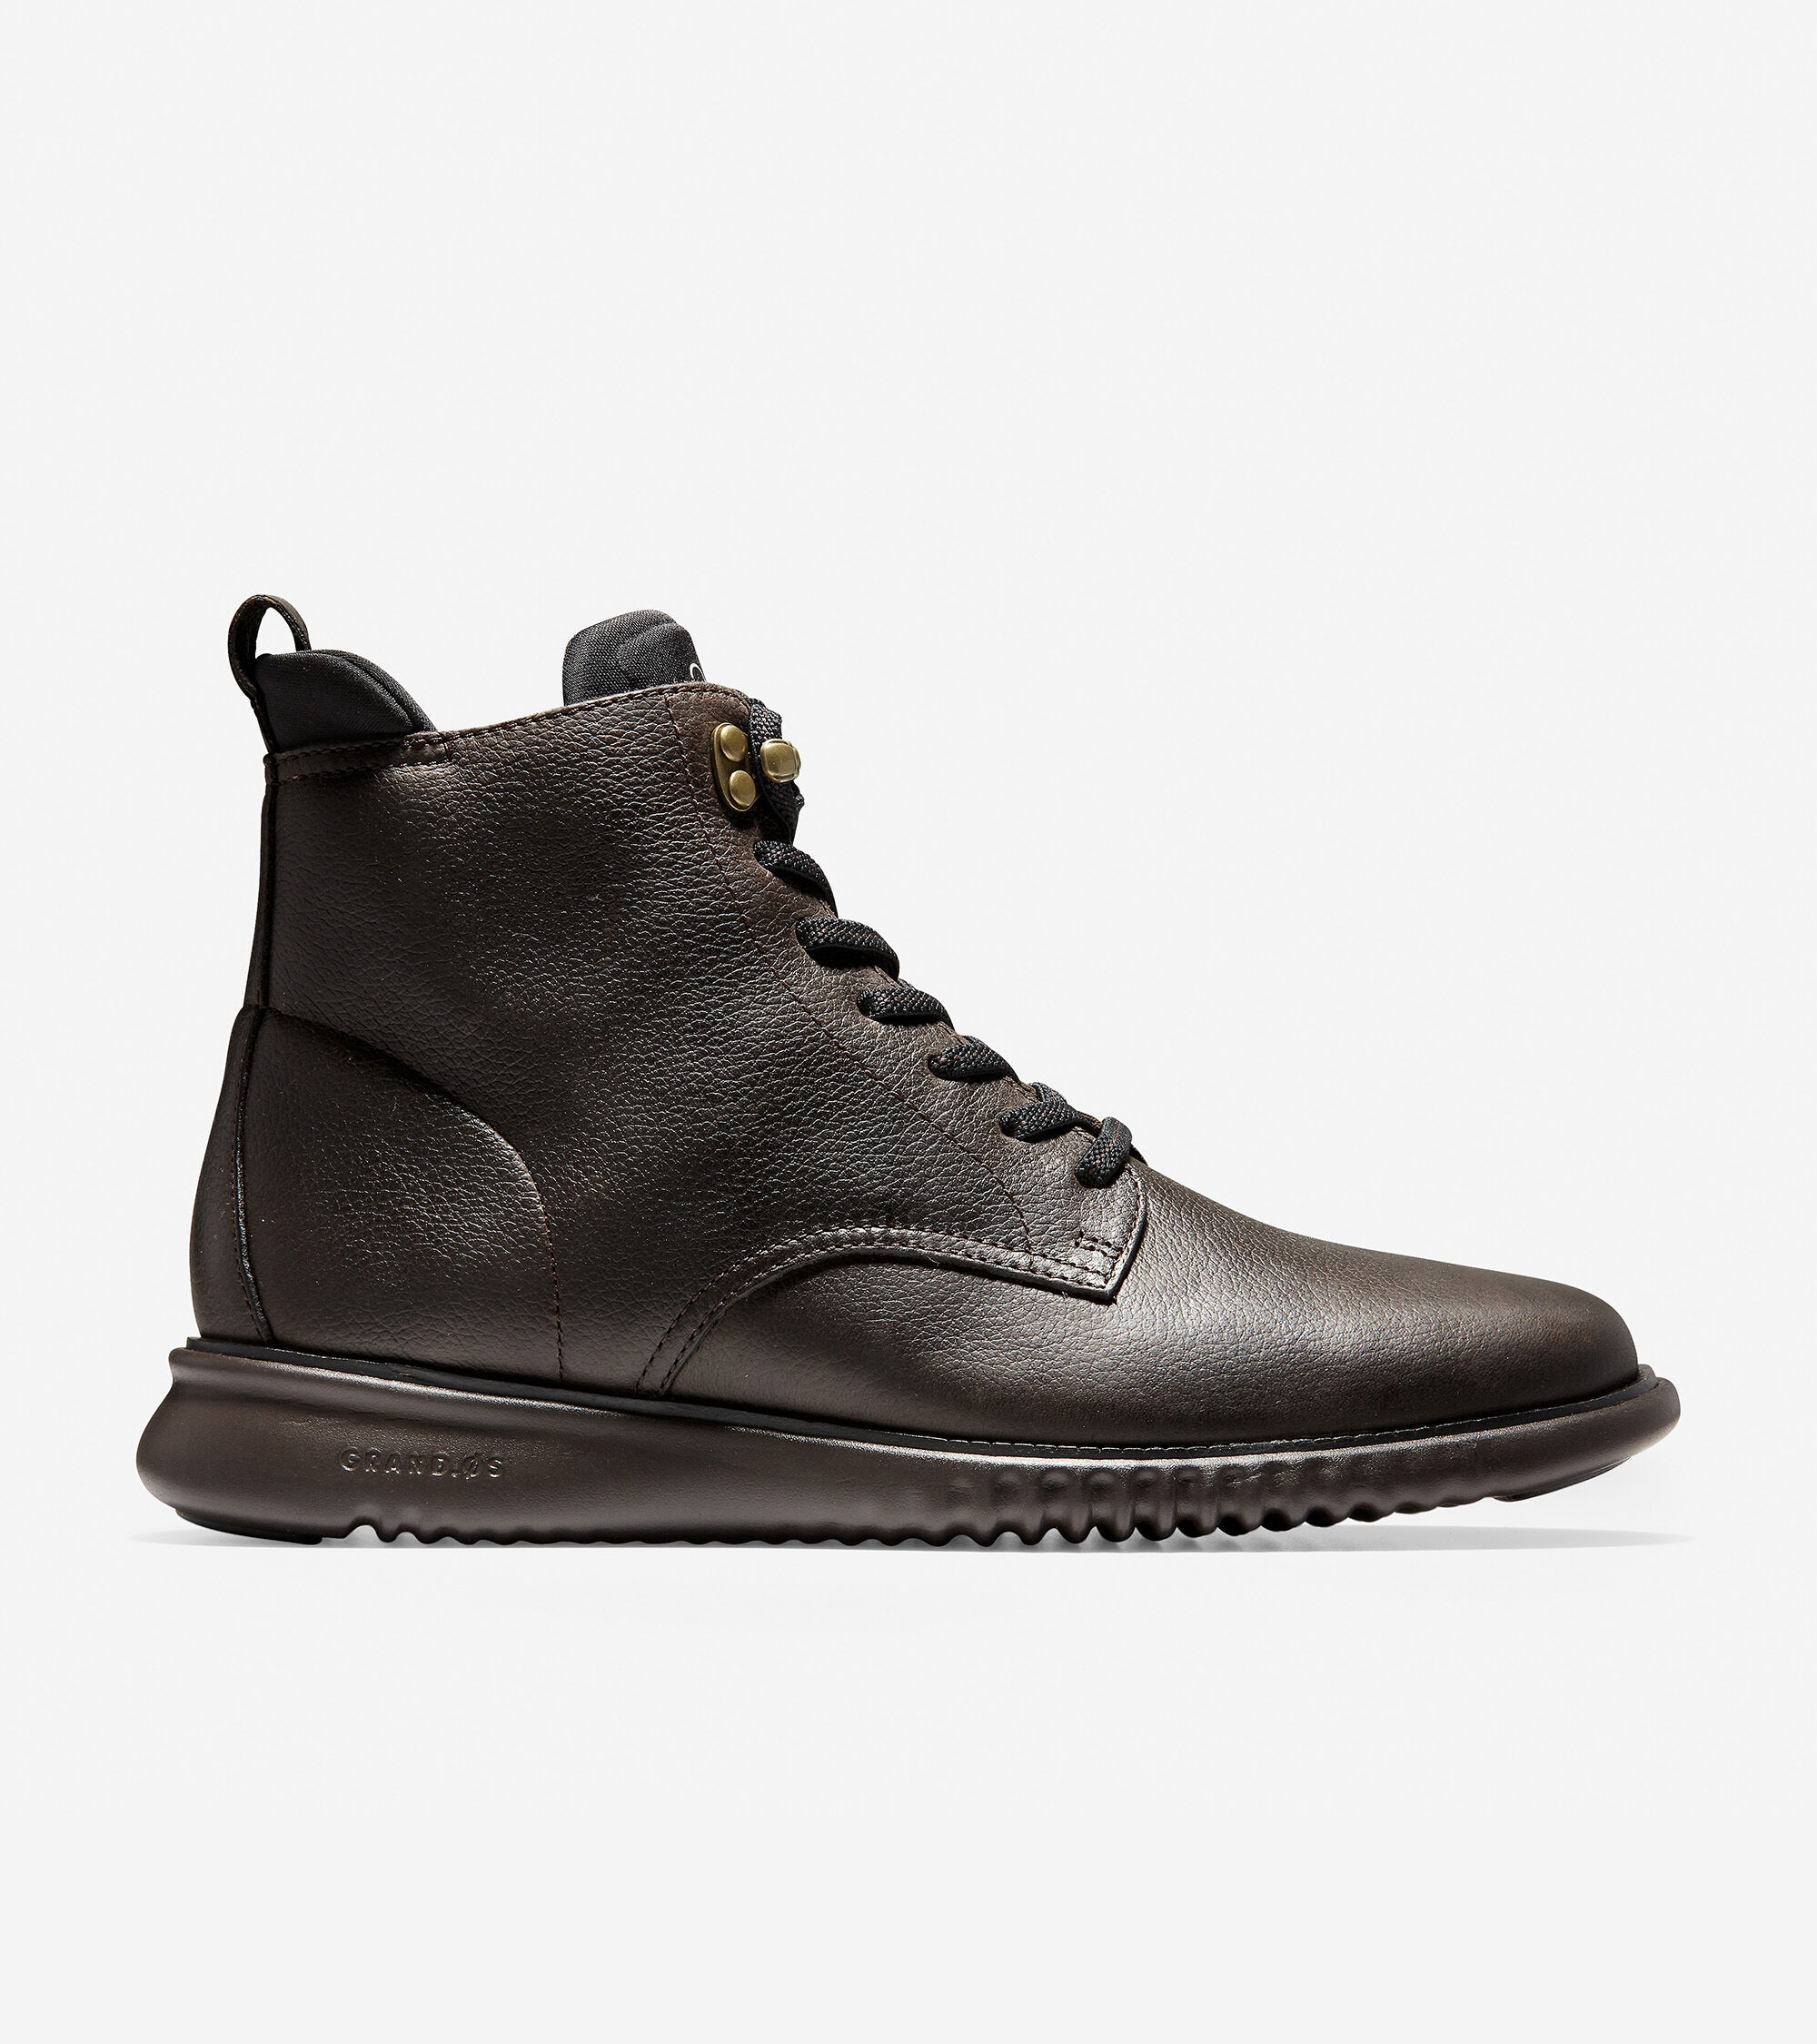 5cb7c04f38a Men s 2.ZEROGRAND Waterproof City Boots in Java